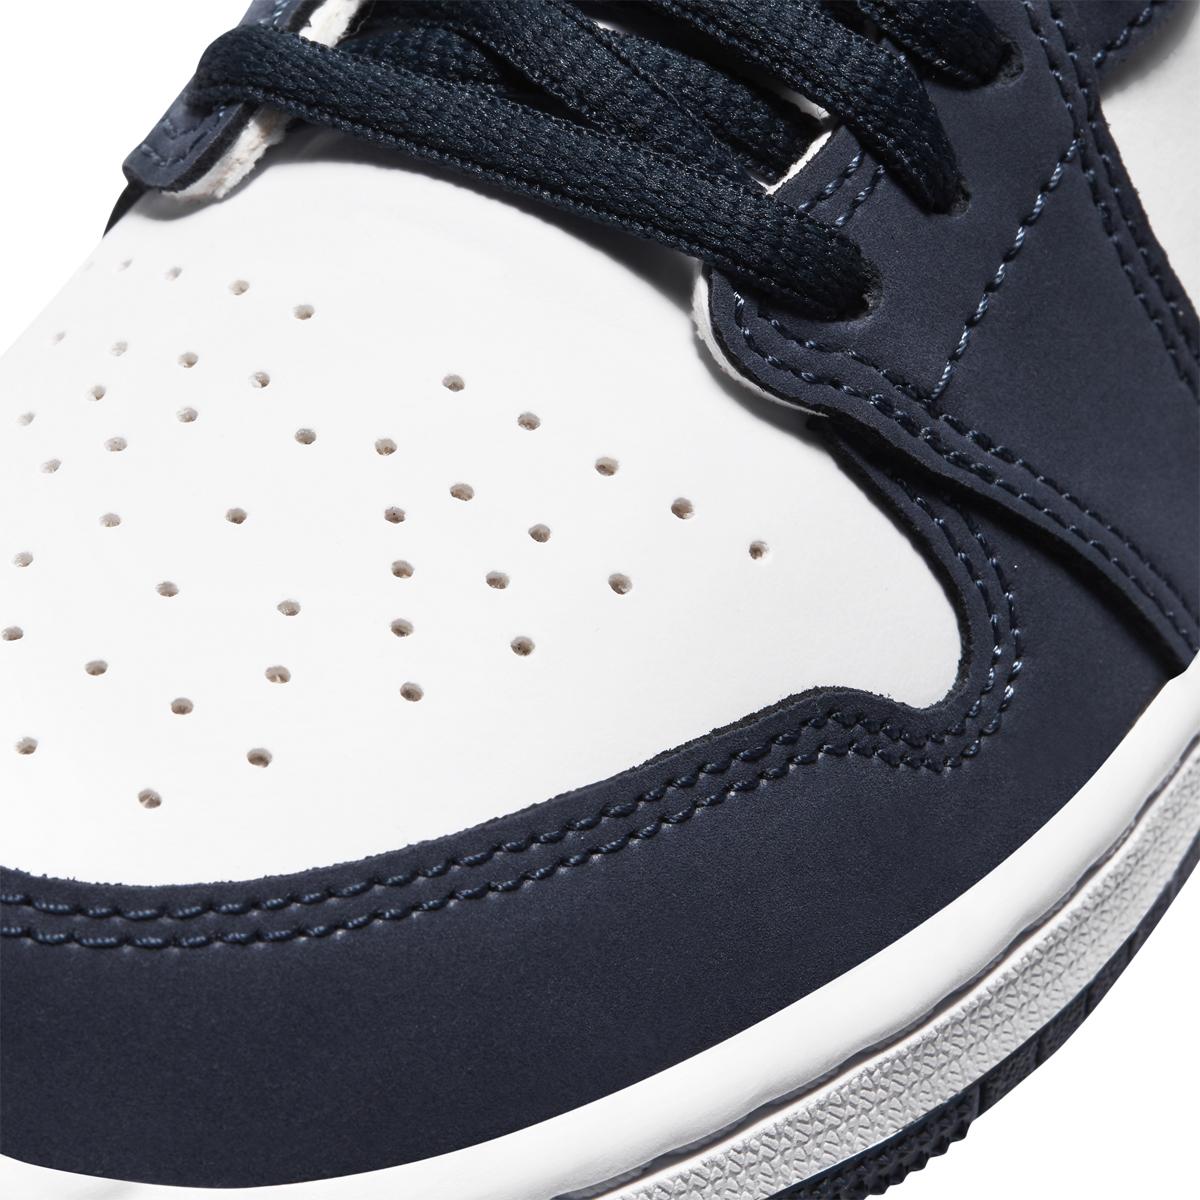 Nike Air Jordan 1 Retro High Youth